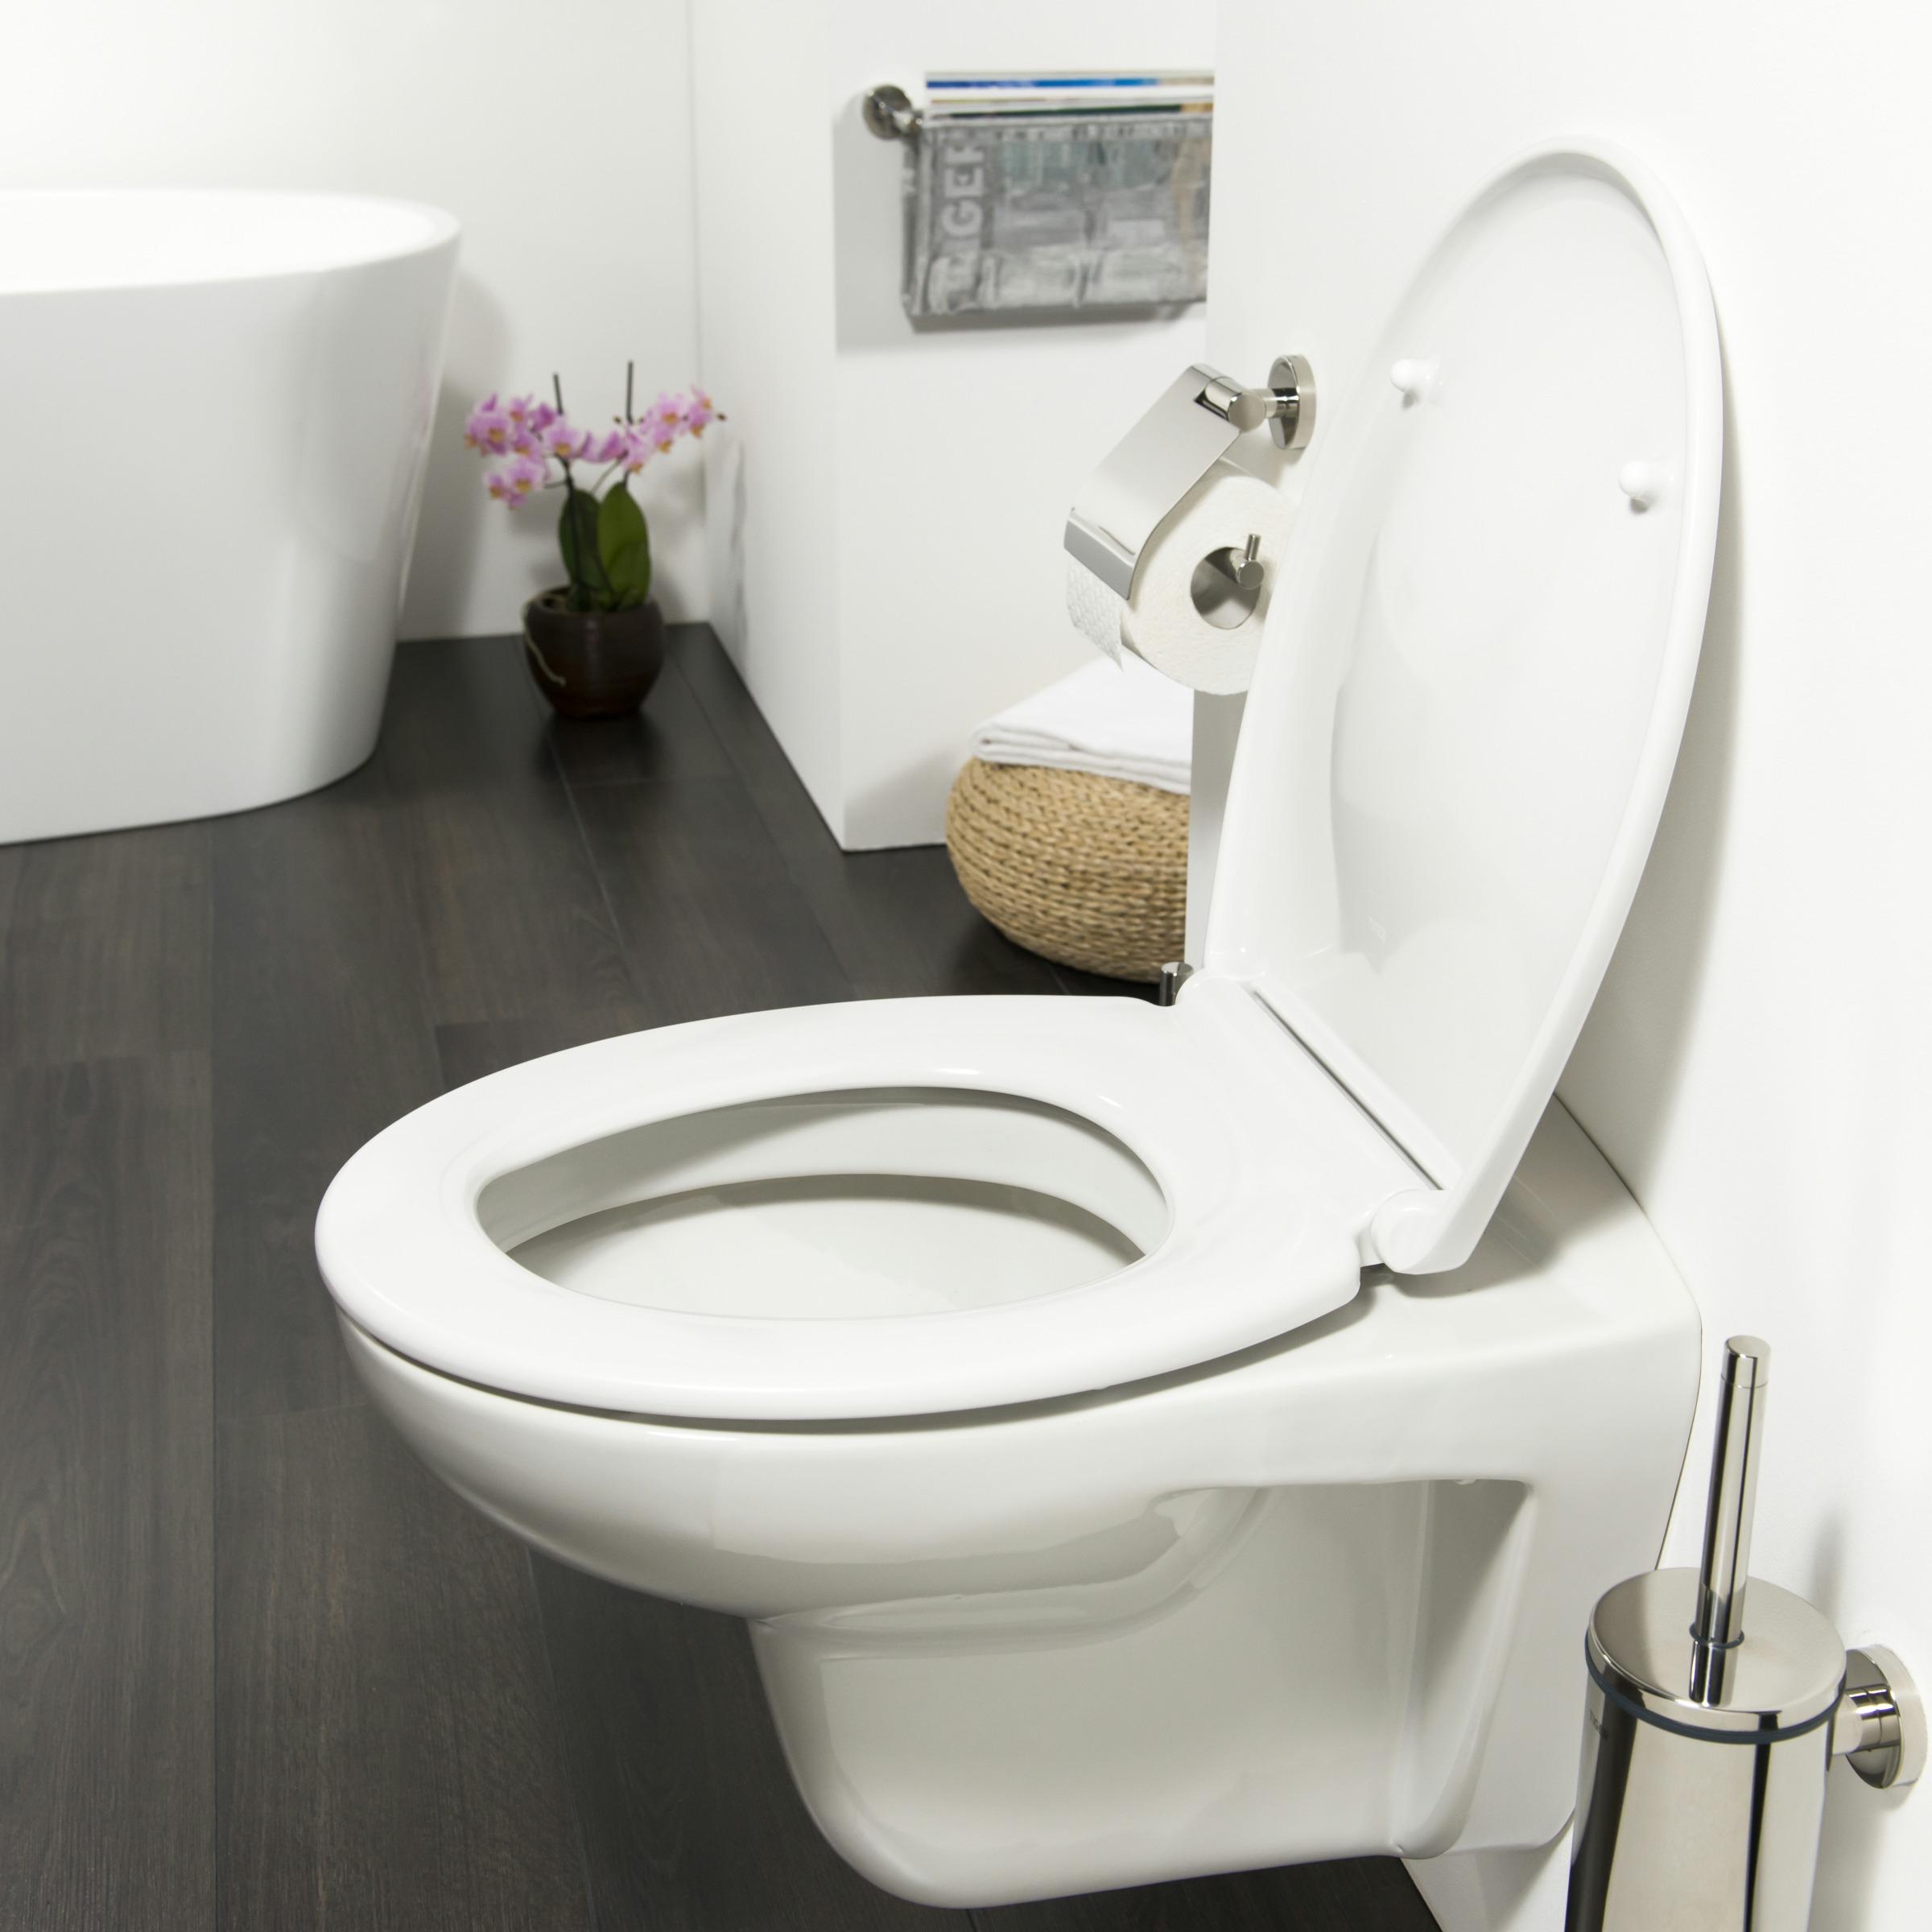 Tiger Ventura toiletbril softclose wit voor €16,18 + kortingsfout in update @ Karwei